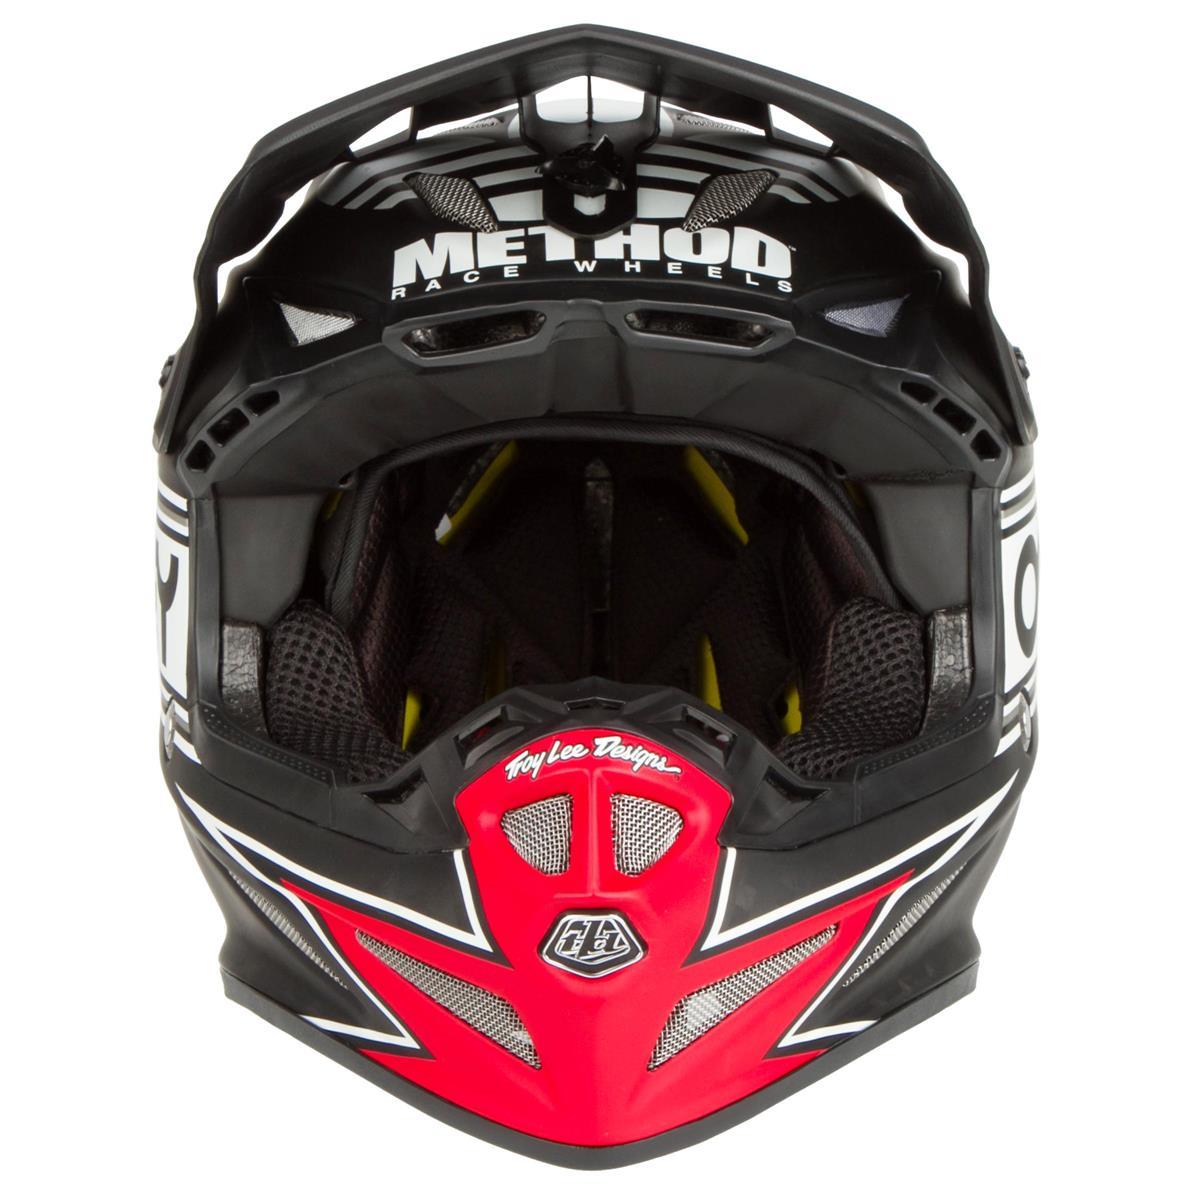 Troy Lee Designs Helmet SE4 Carbon MIPS ULTRA Limited Edition Adidas Team Black